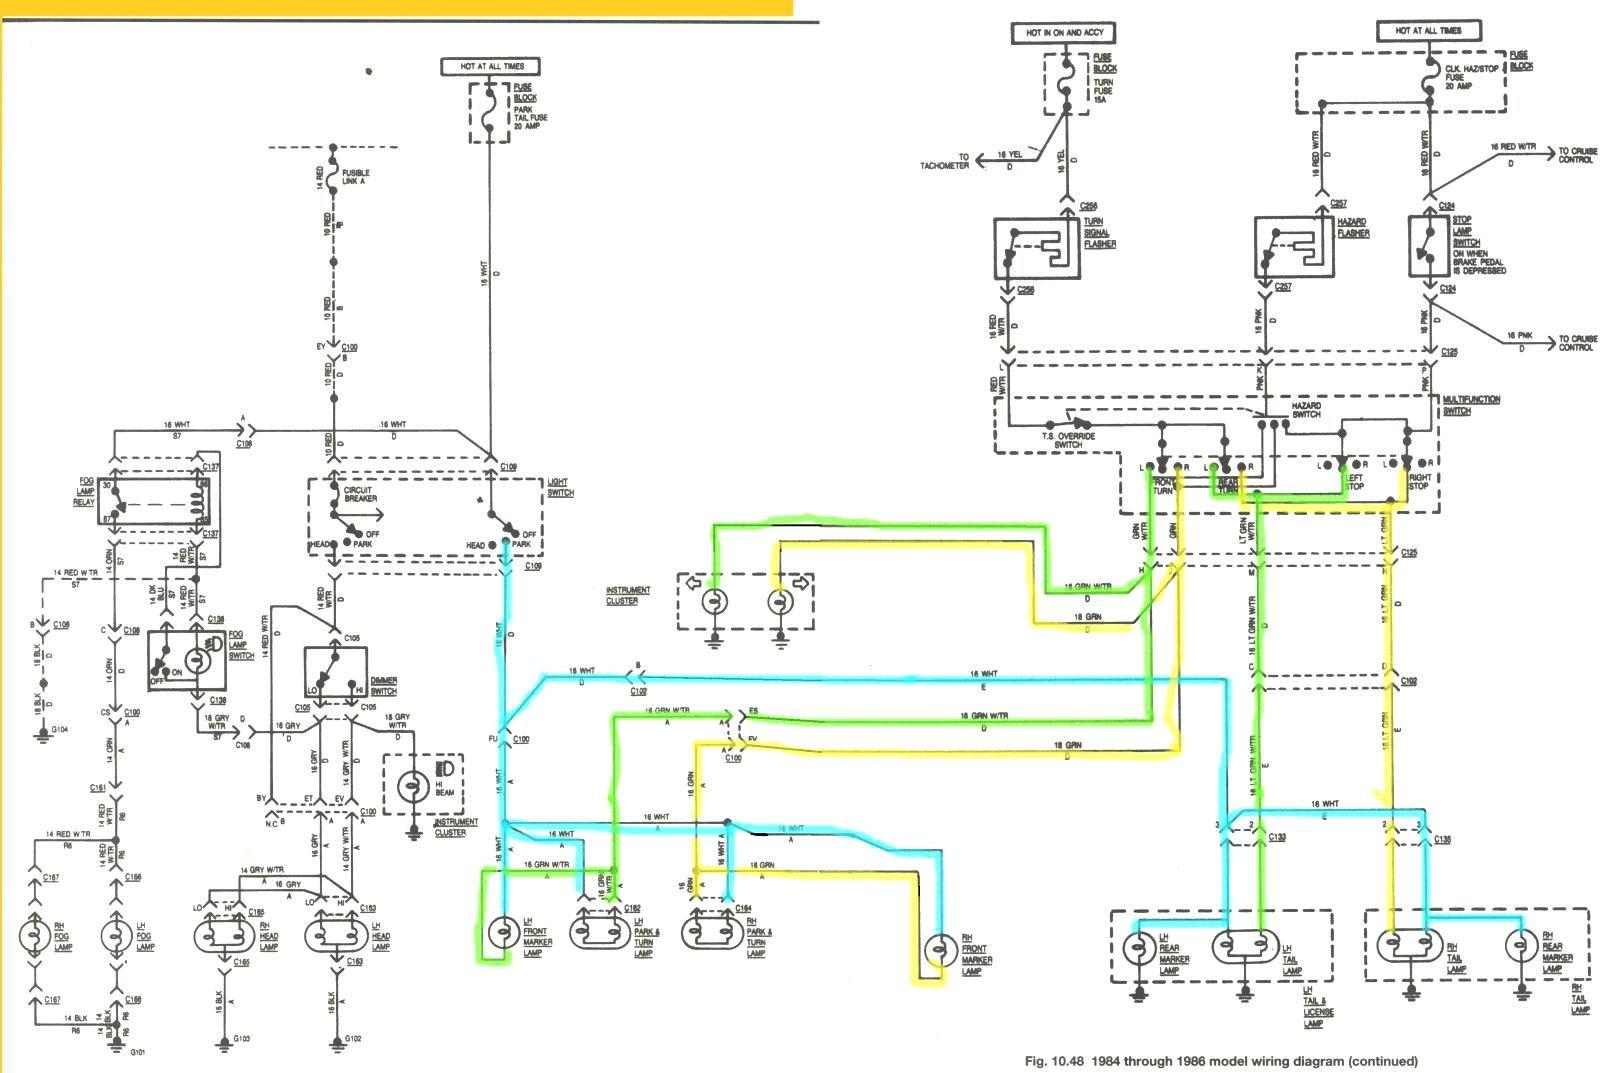 ford 3600 diesel tractor wiring diagram - wiring diagram bear-cable -  bear-cable.piuconzero.it  piuconzero.it